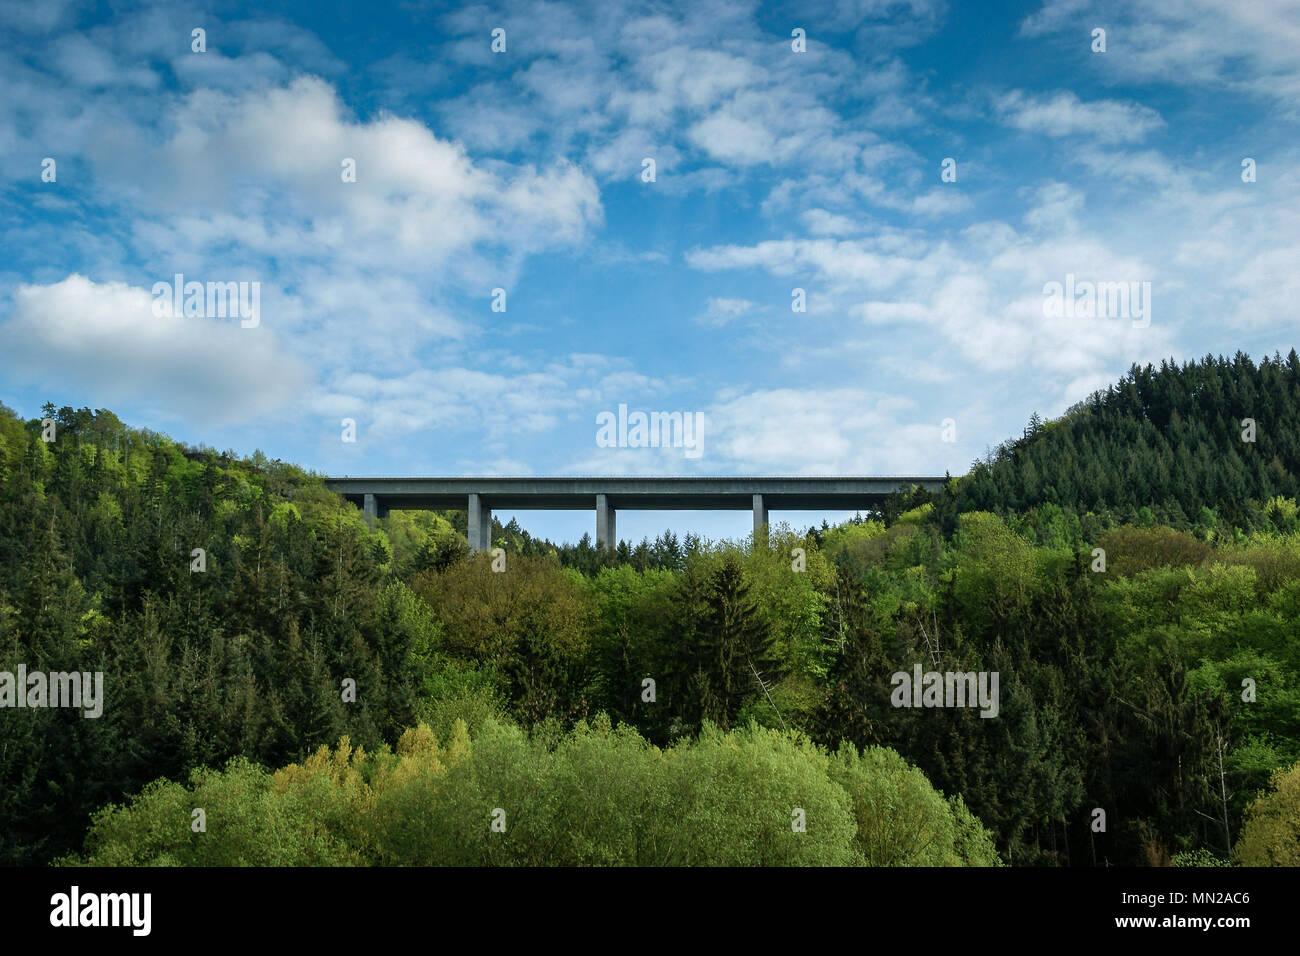 bridge over forest - Stock Image